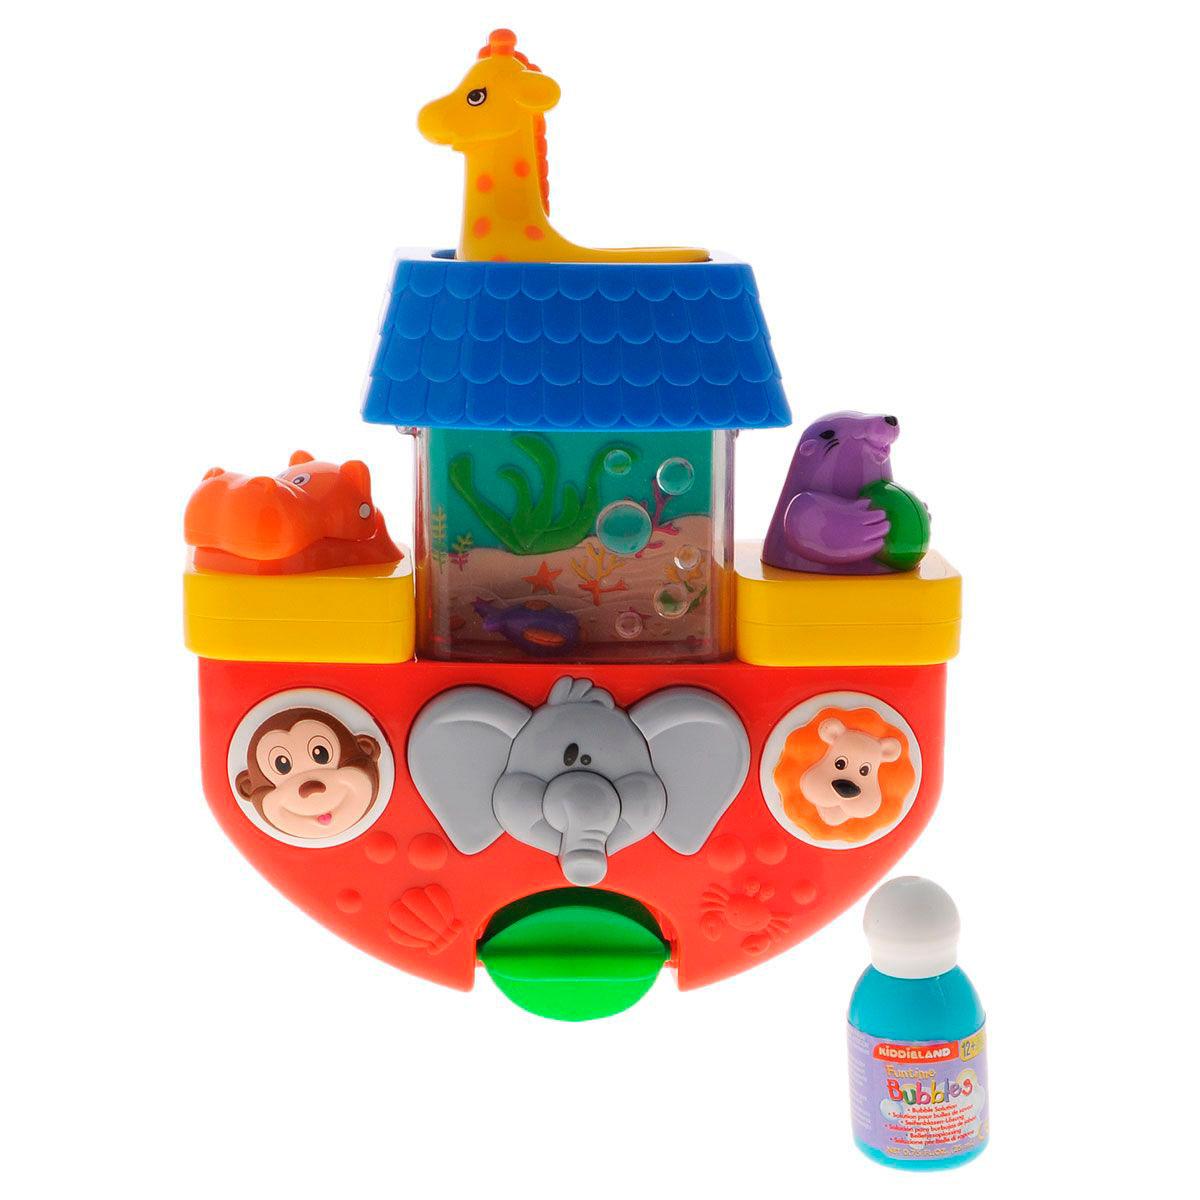 Центр для ванной – КорабликИгрушки для ванной<br>Центр для ванной – Кораблик<br>